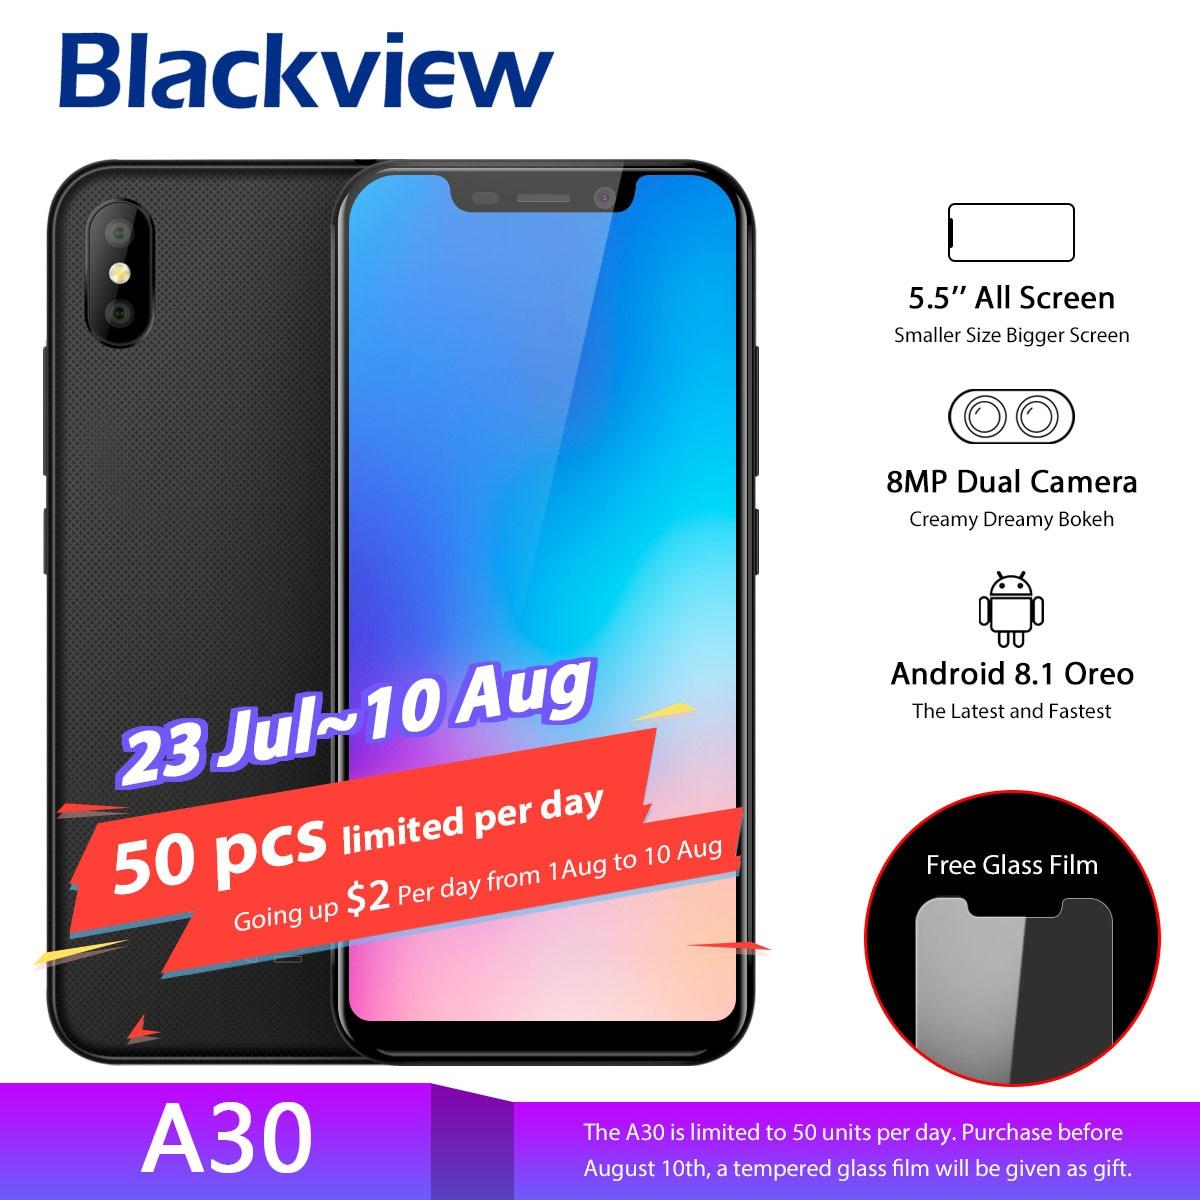 Blackview A30 3g Smartphone 5.5